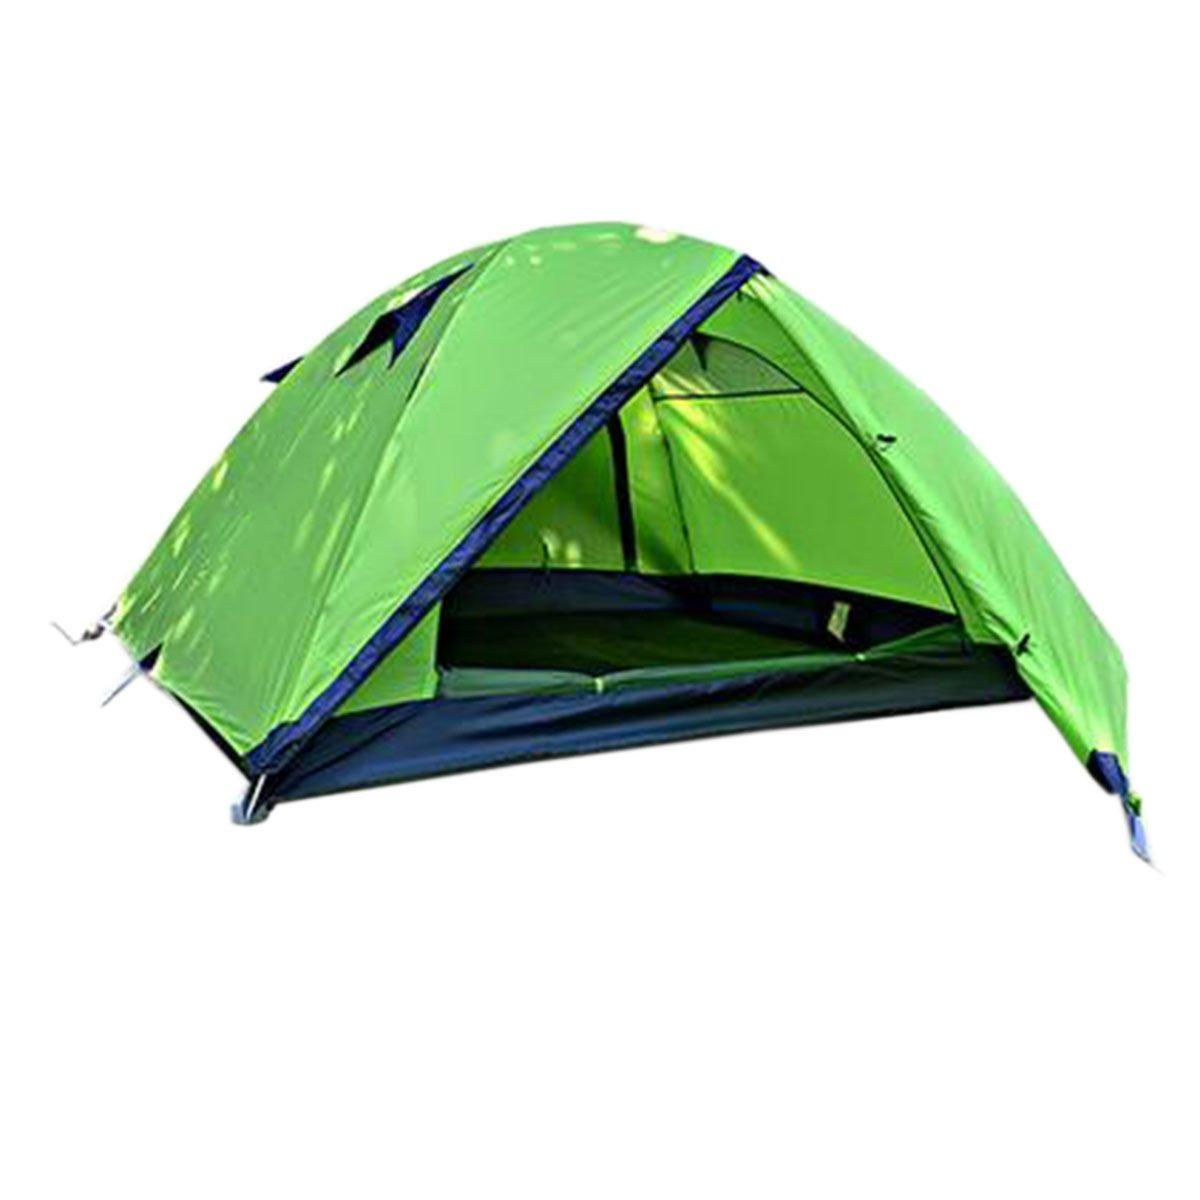 TZQ Anti-Regen Outdoor Multiplayer Campingzelte,Grün